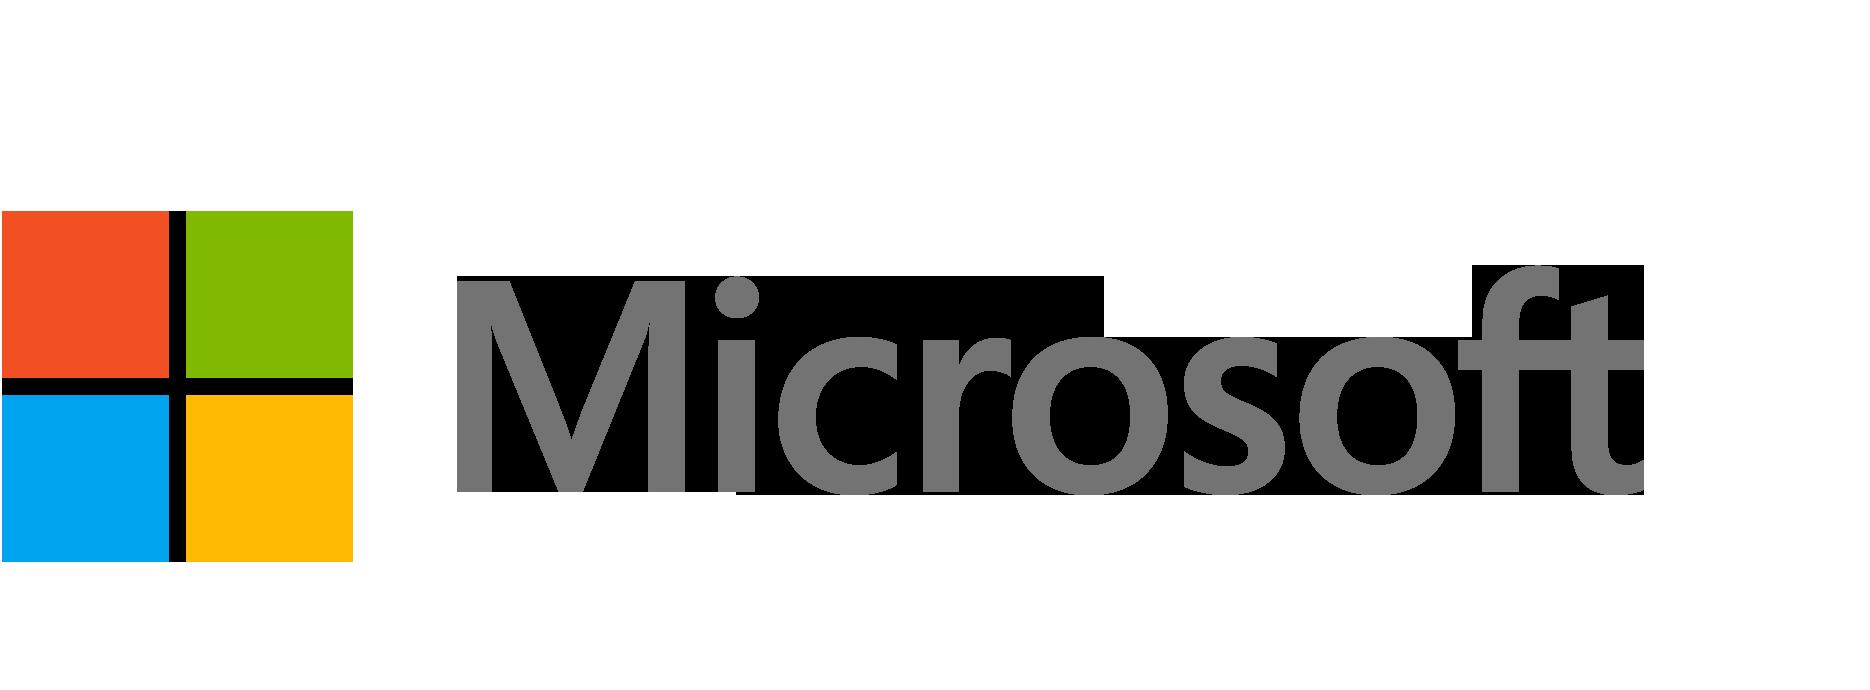 Windows Server CAL - 1 User CAL - 1 year (DG7GMGF0DVT7)